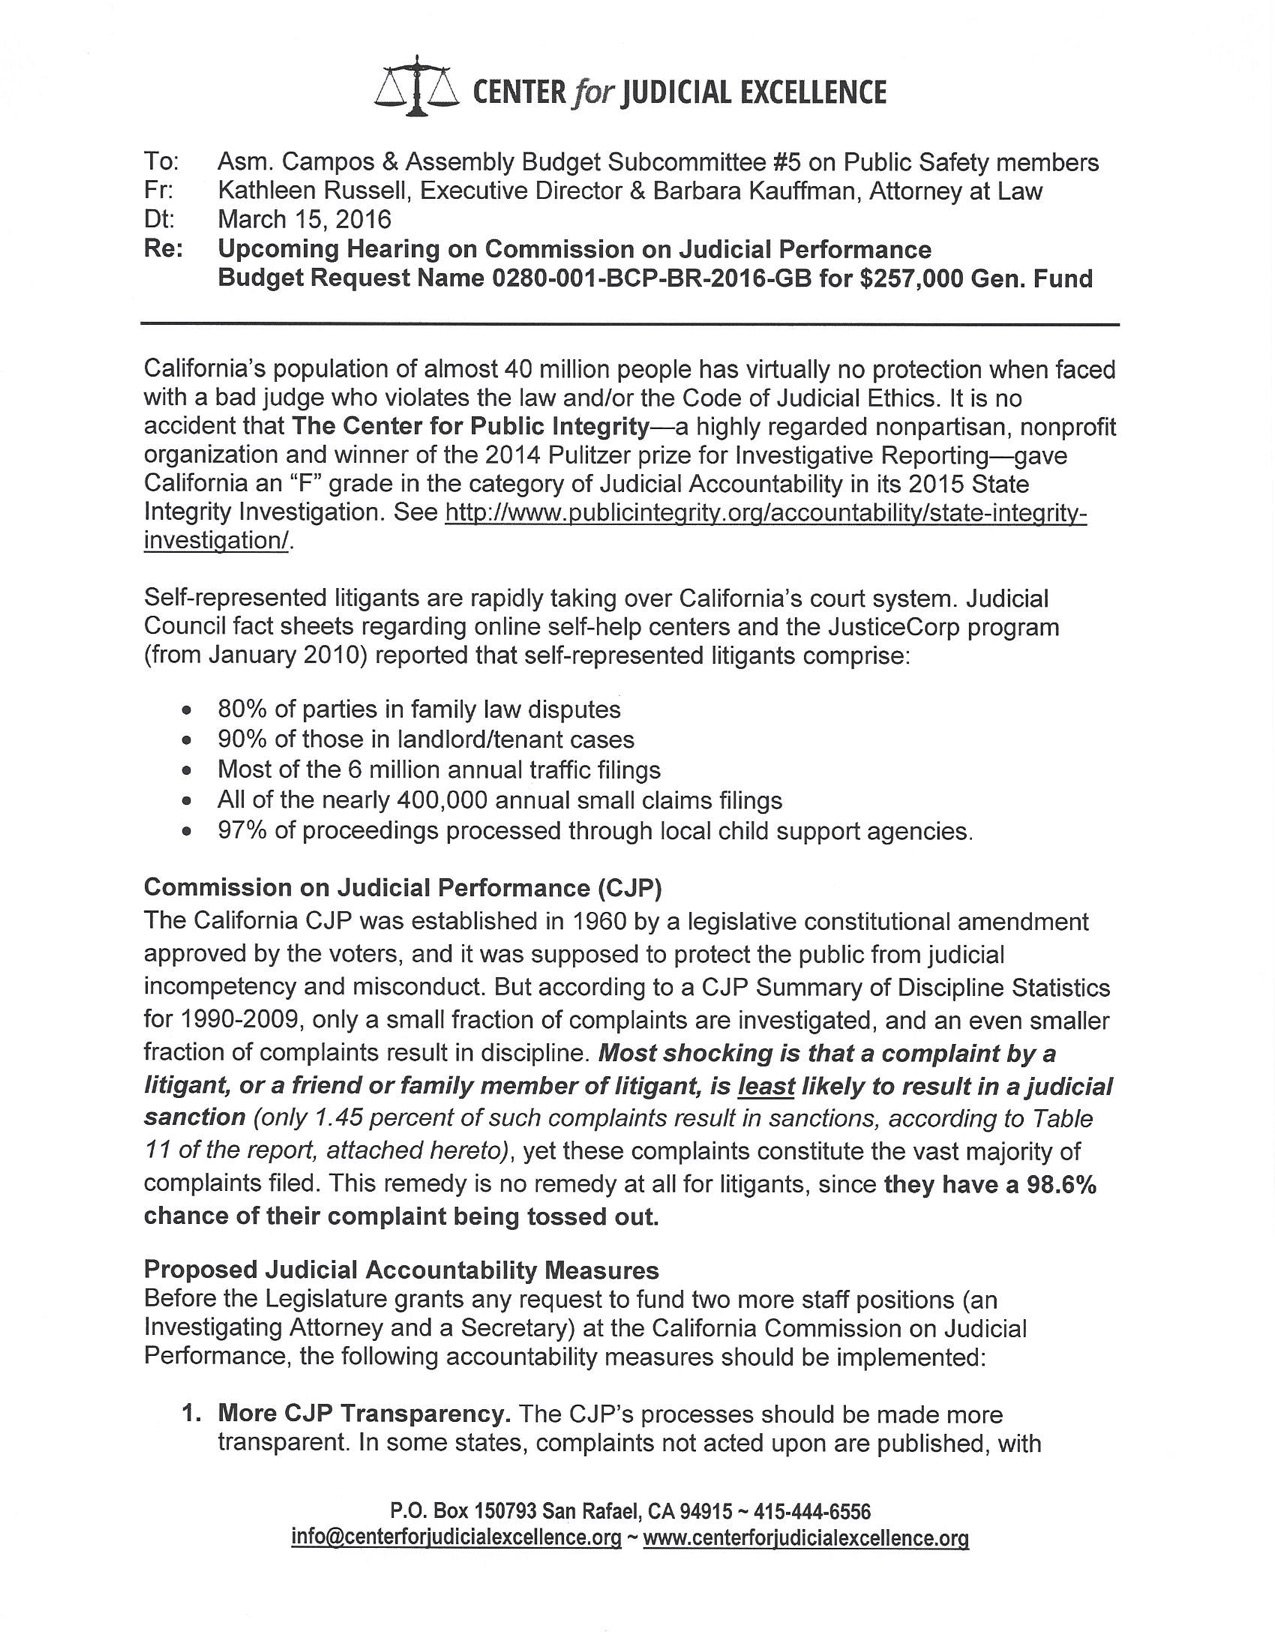 Handout for 3.16.16 meeting re CJP